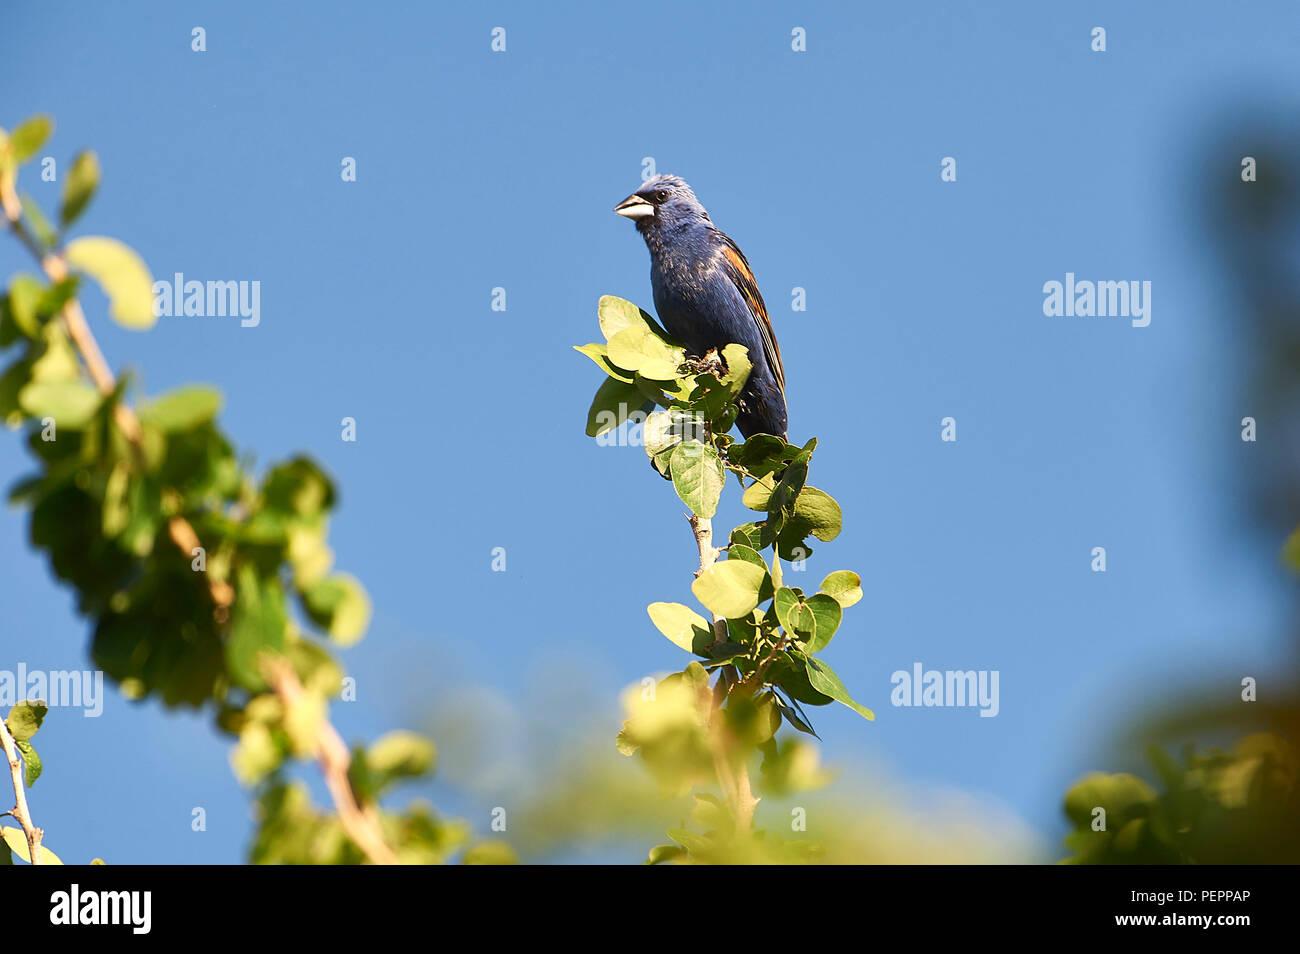 Blue Grosbeak (Passerina caerulea) perched in a tree, Alan Lloyd trail, Ajijic, Jalisco, Mexico - Stock Image